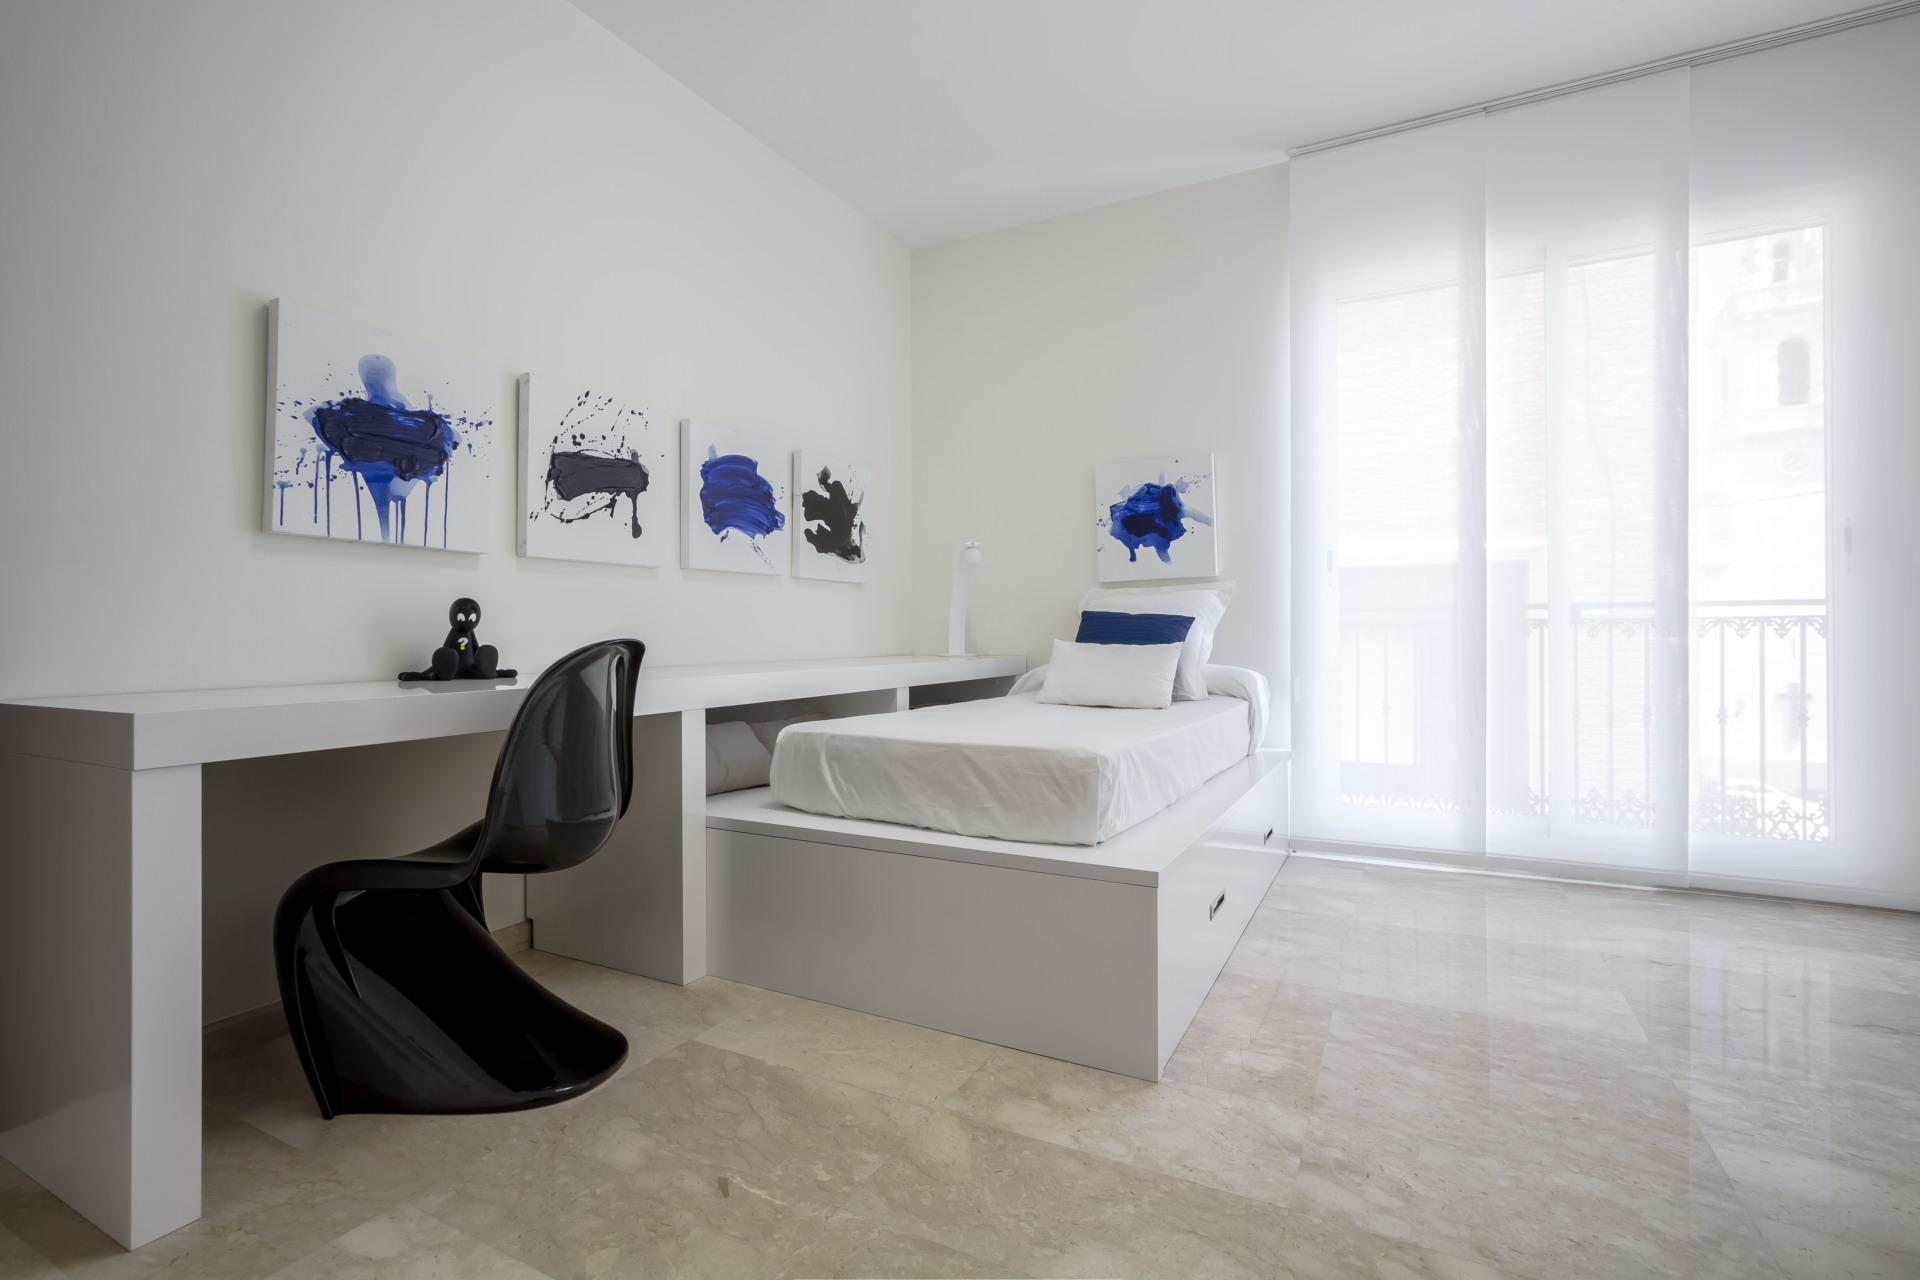 fotografia-arquitectura-interiorismo-valencia-german-cabo-daniela-beaini-alcacer (13)